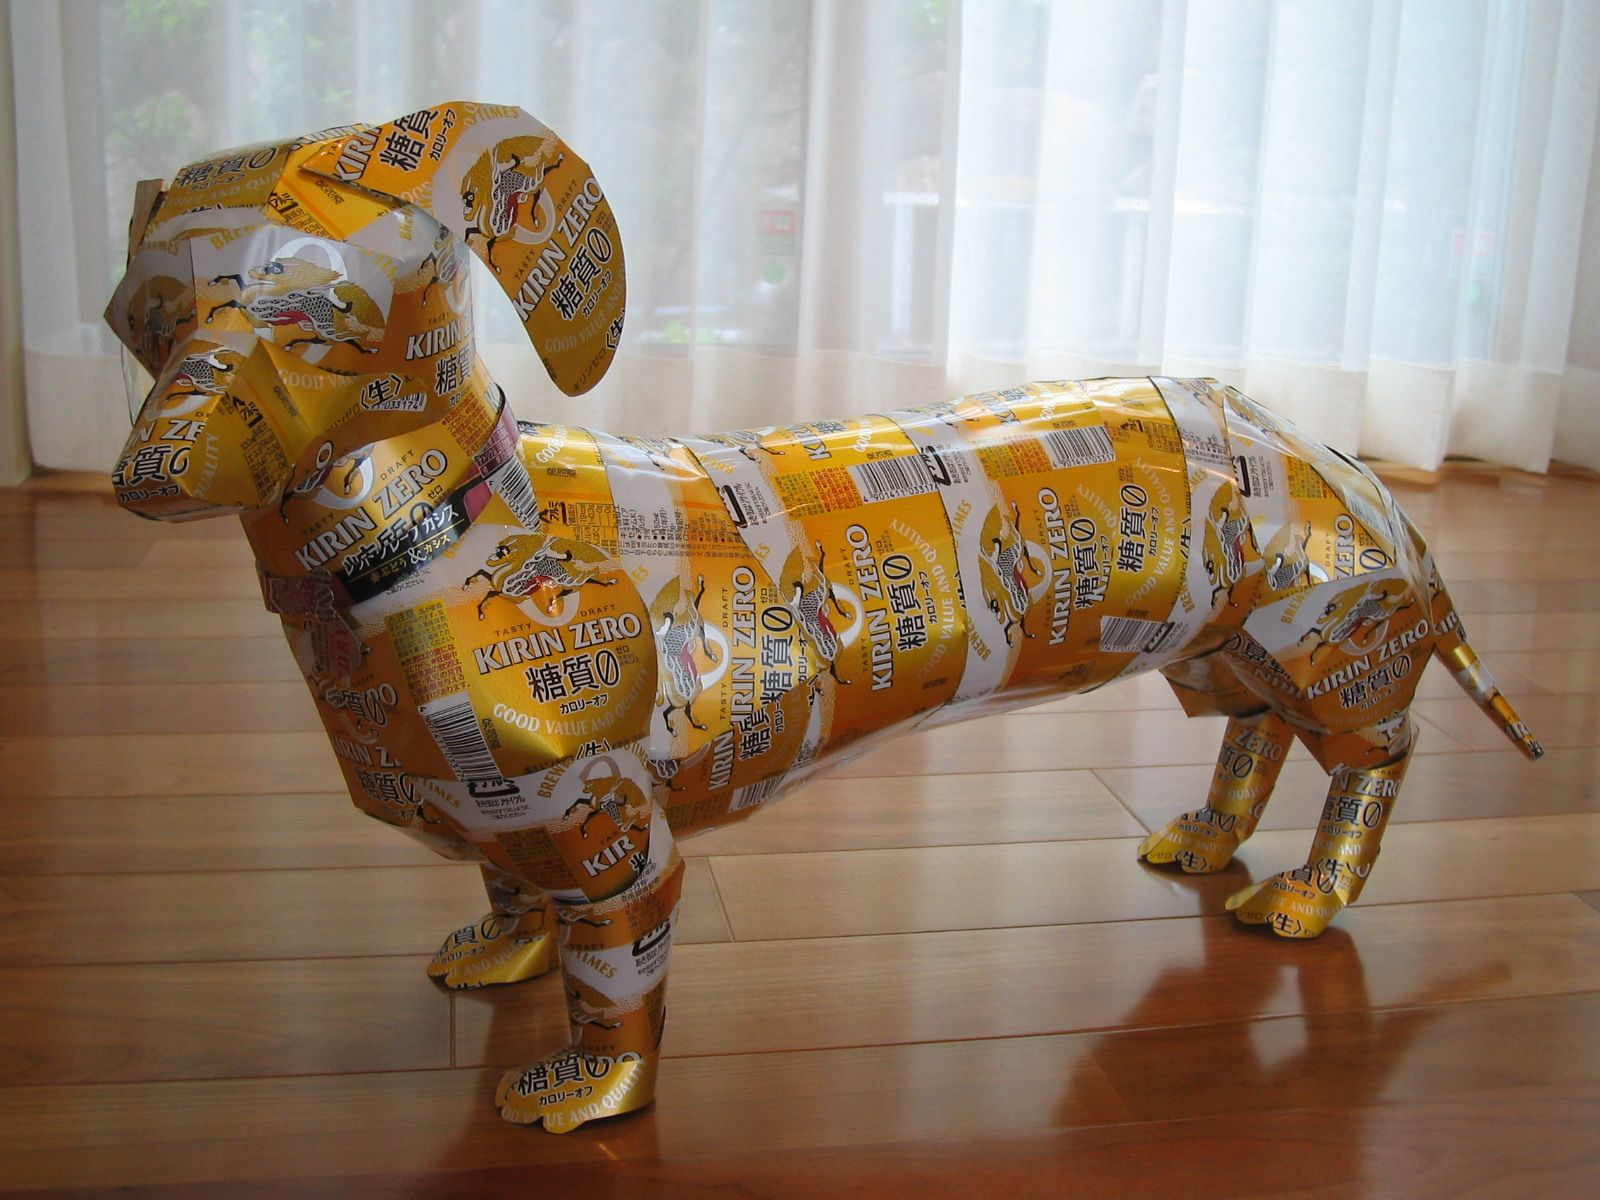 Creación de esculturas con latas de bebidas